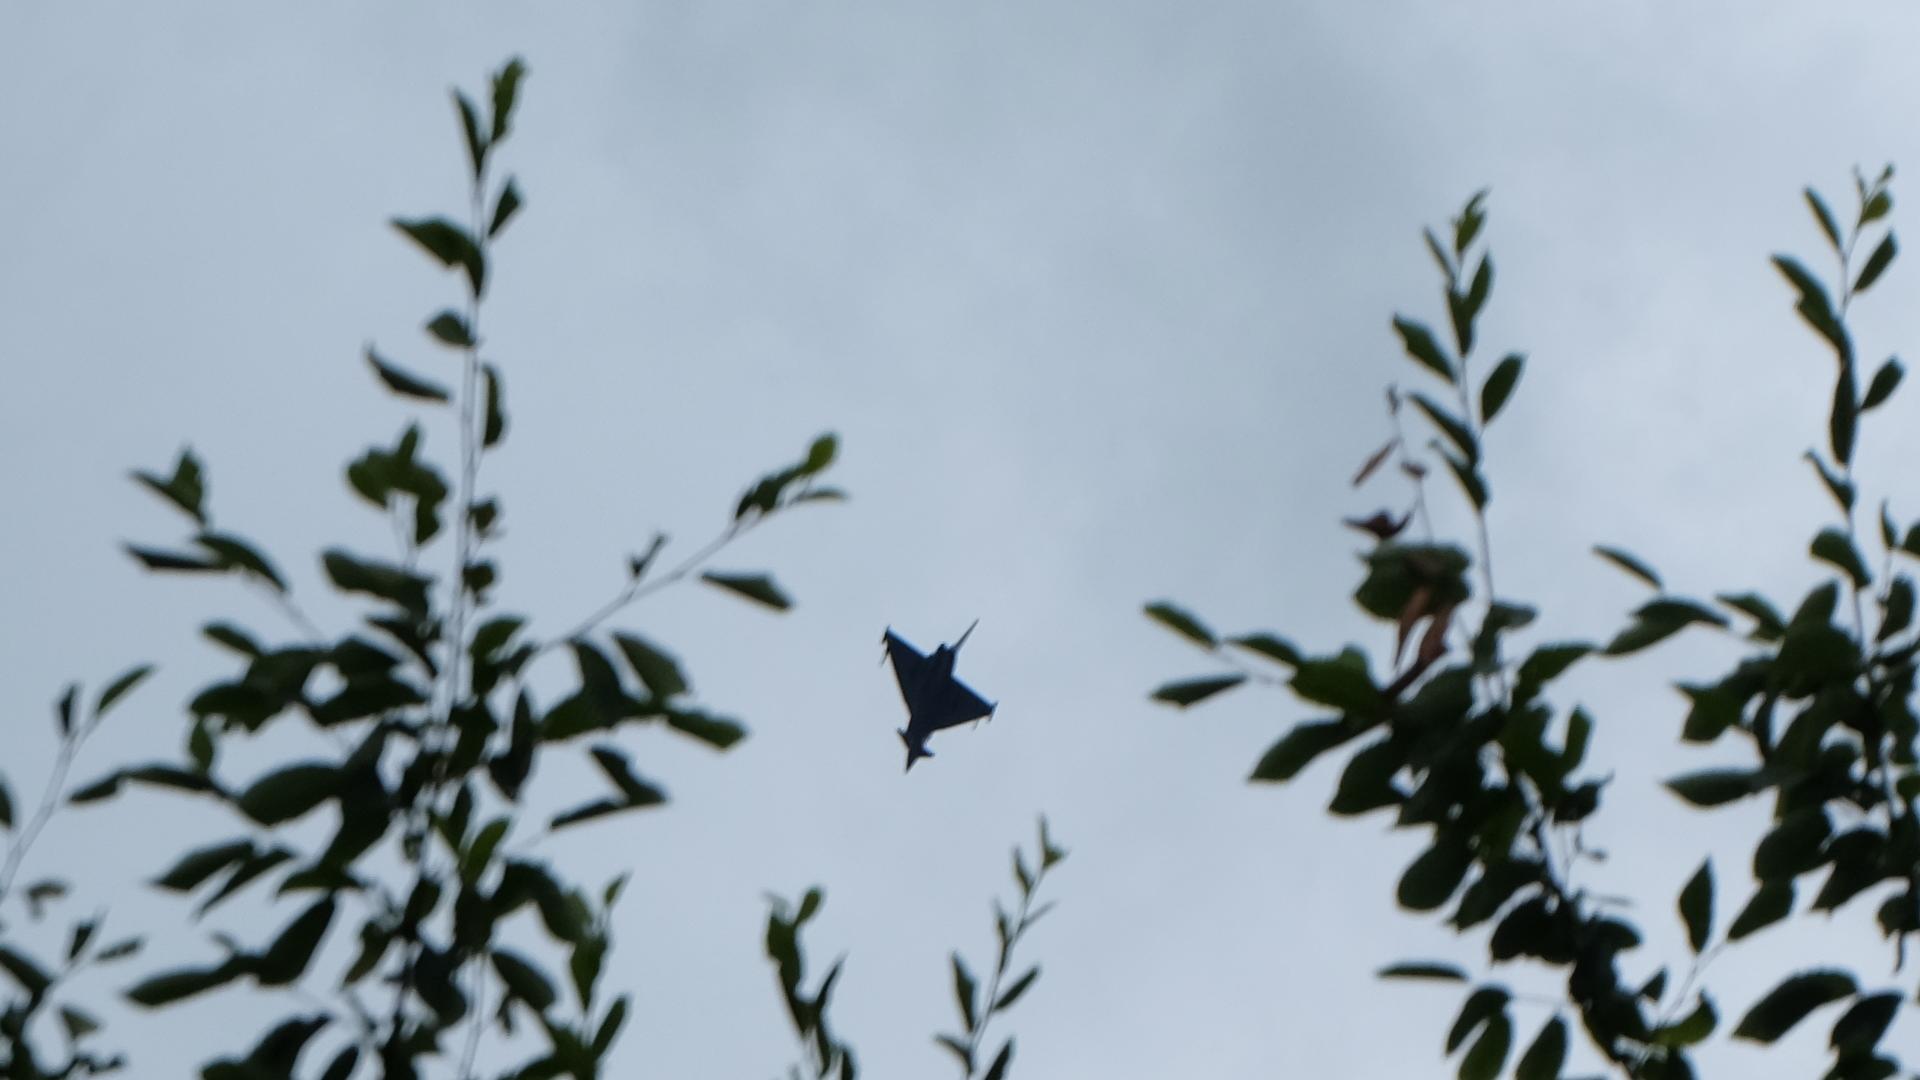 Eurofighter-Tiefflug-Bundesheer-Samitzteich-Graz